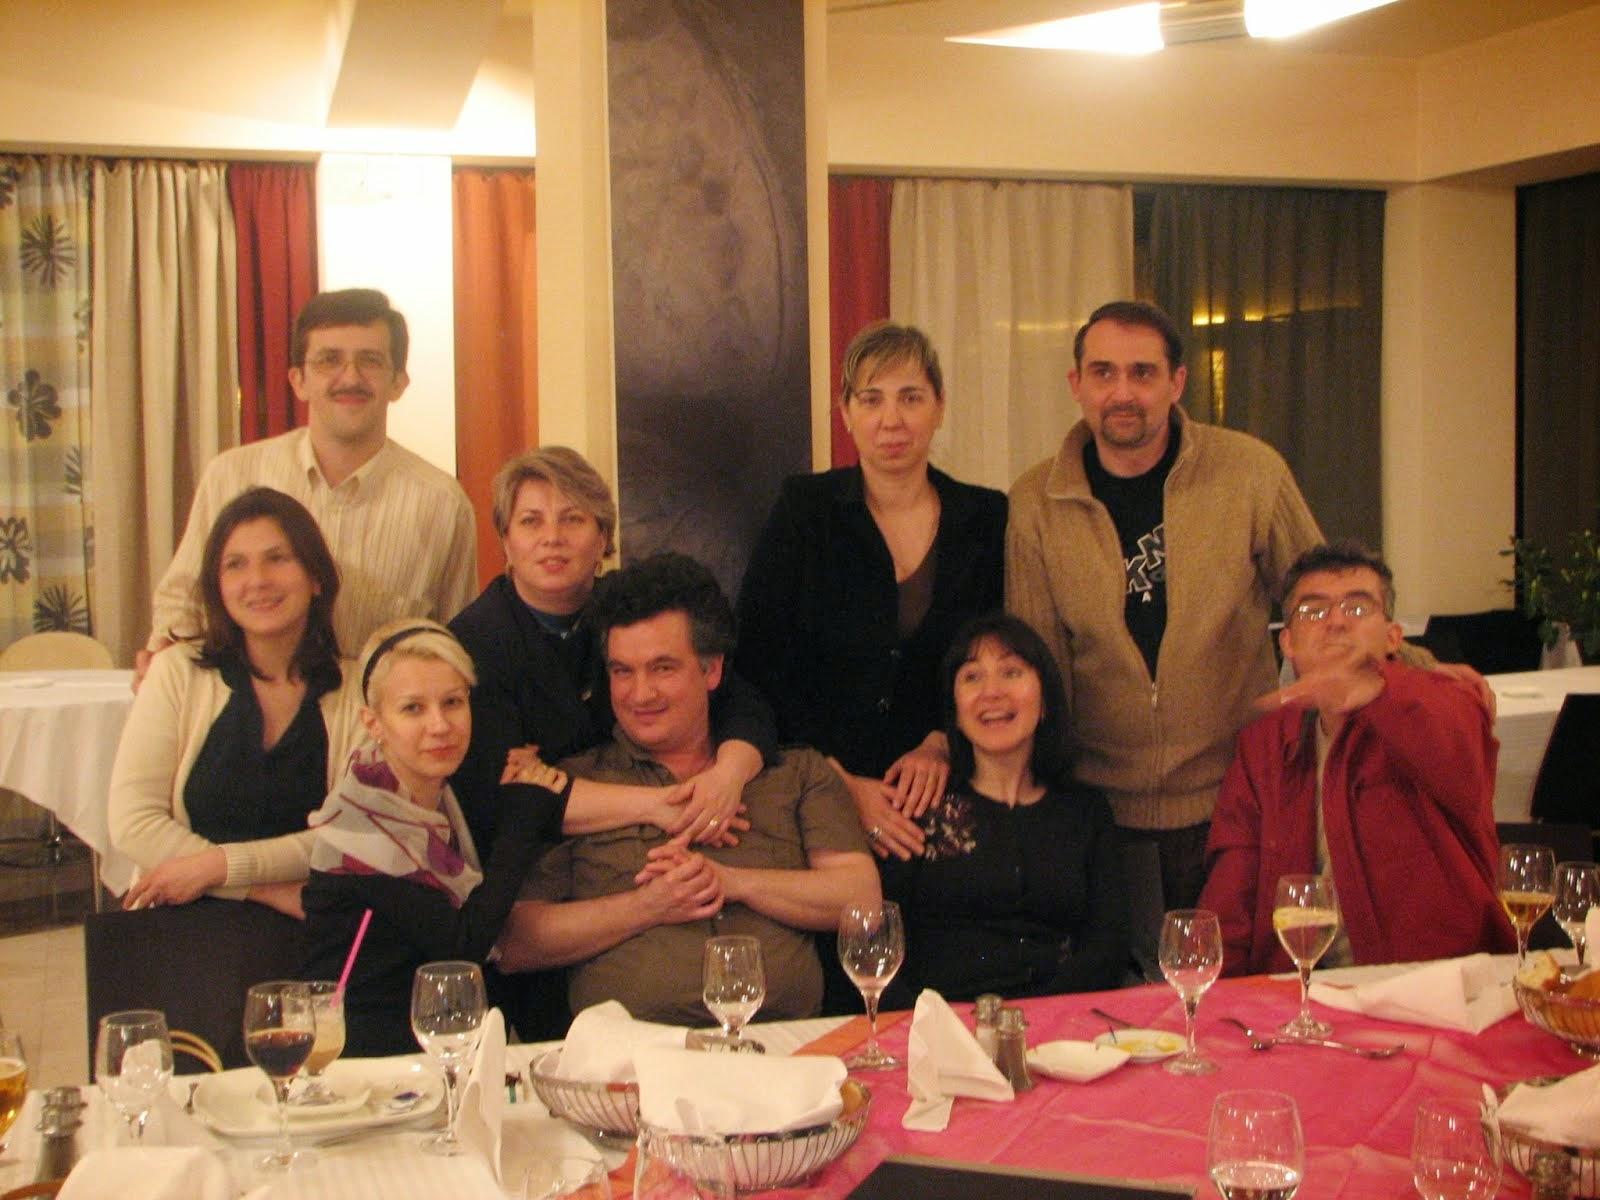 Olivia Maria Marcov Andrei Dobrescu 12 V 30 Martie 2007 Bucharest Romania